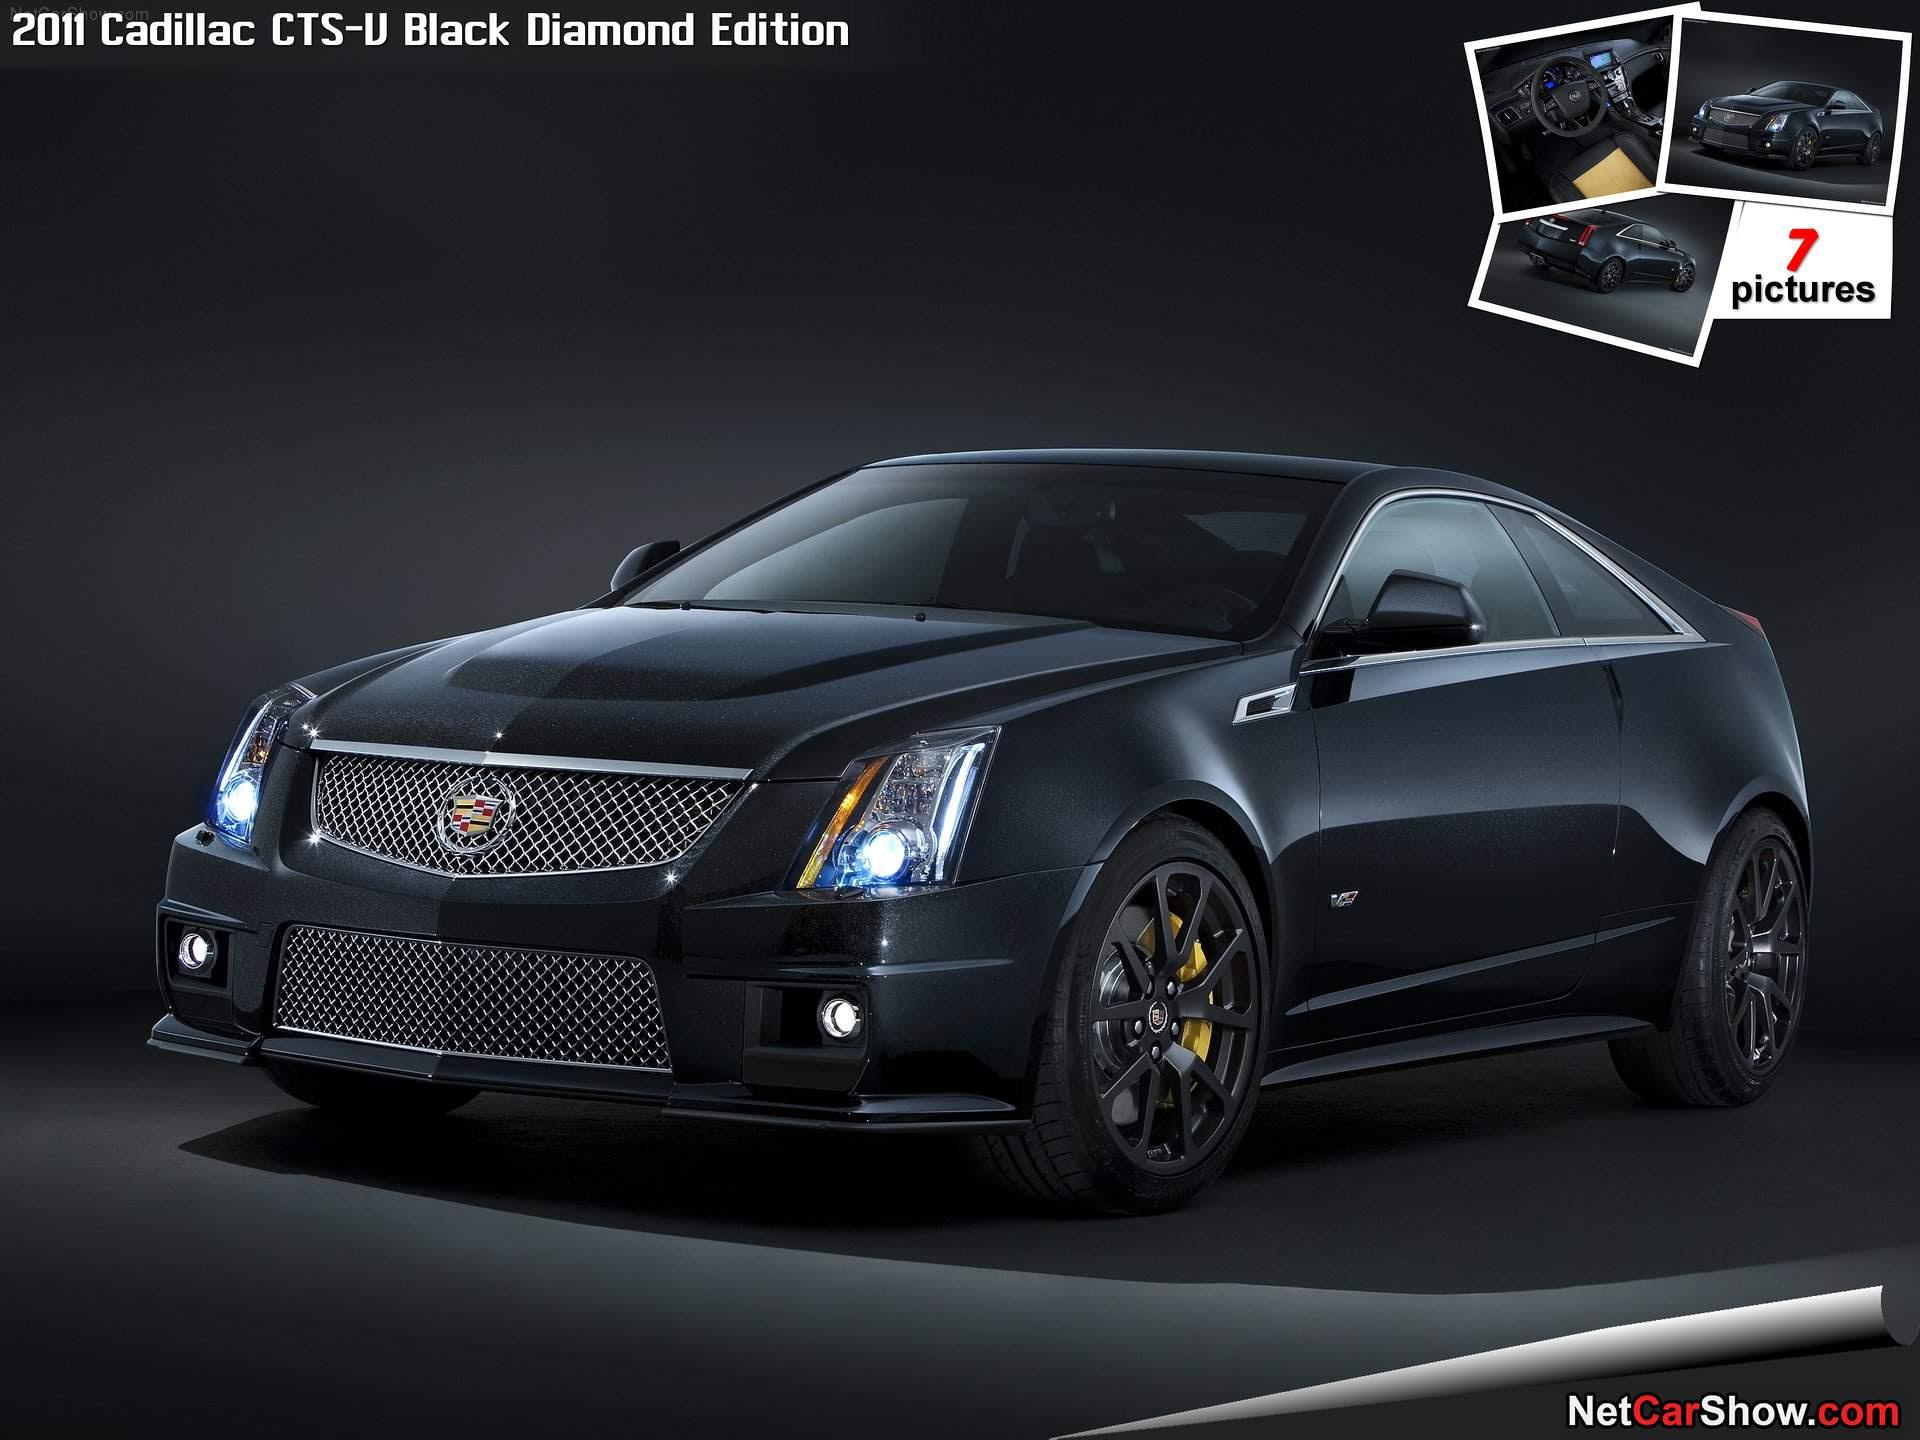 Cadillac CTS-V Black Diamond Edition (2011)